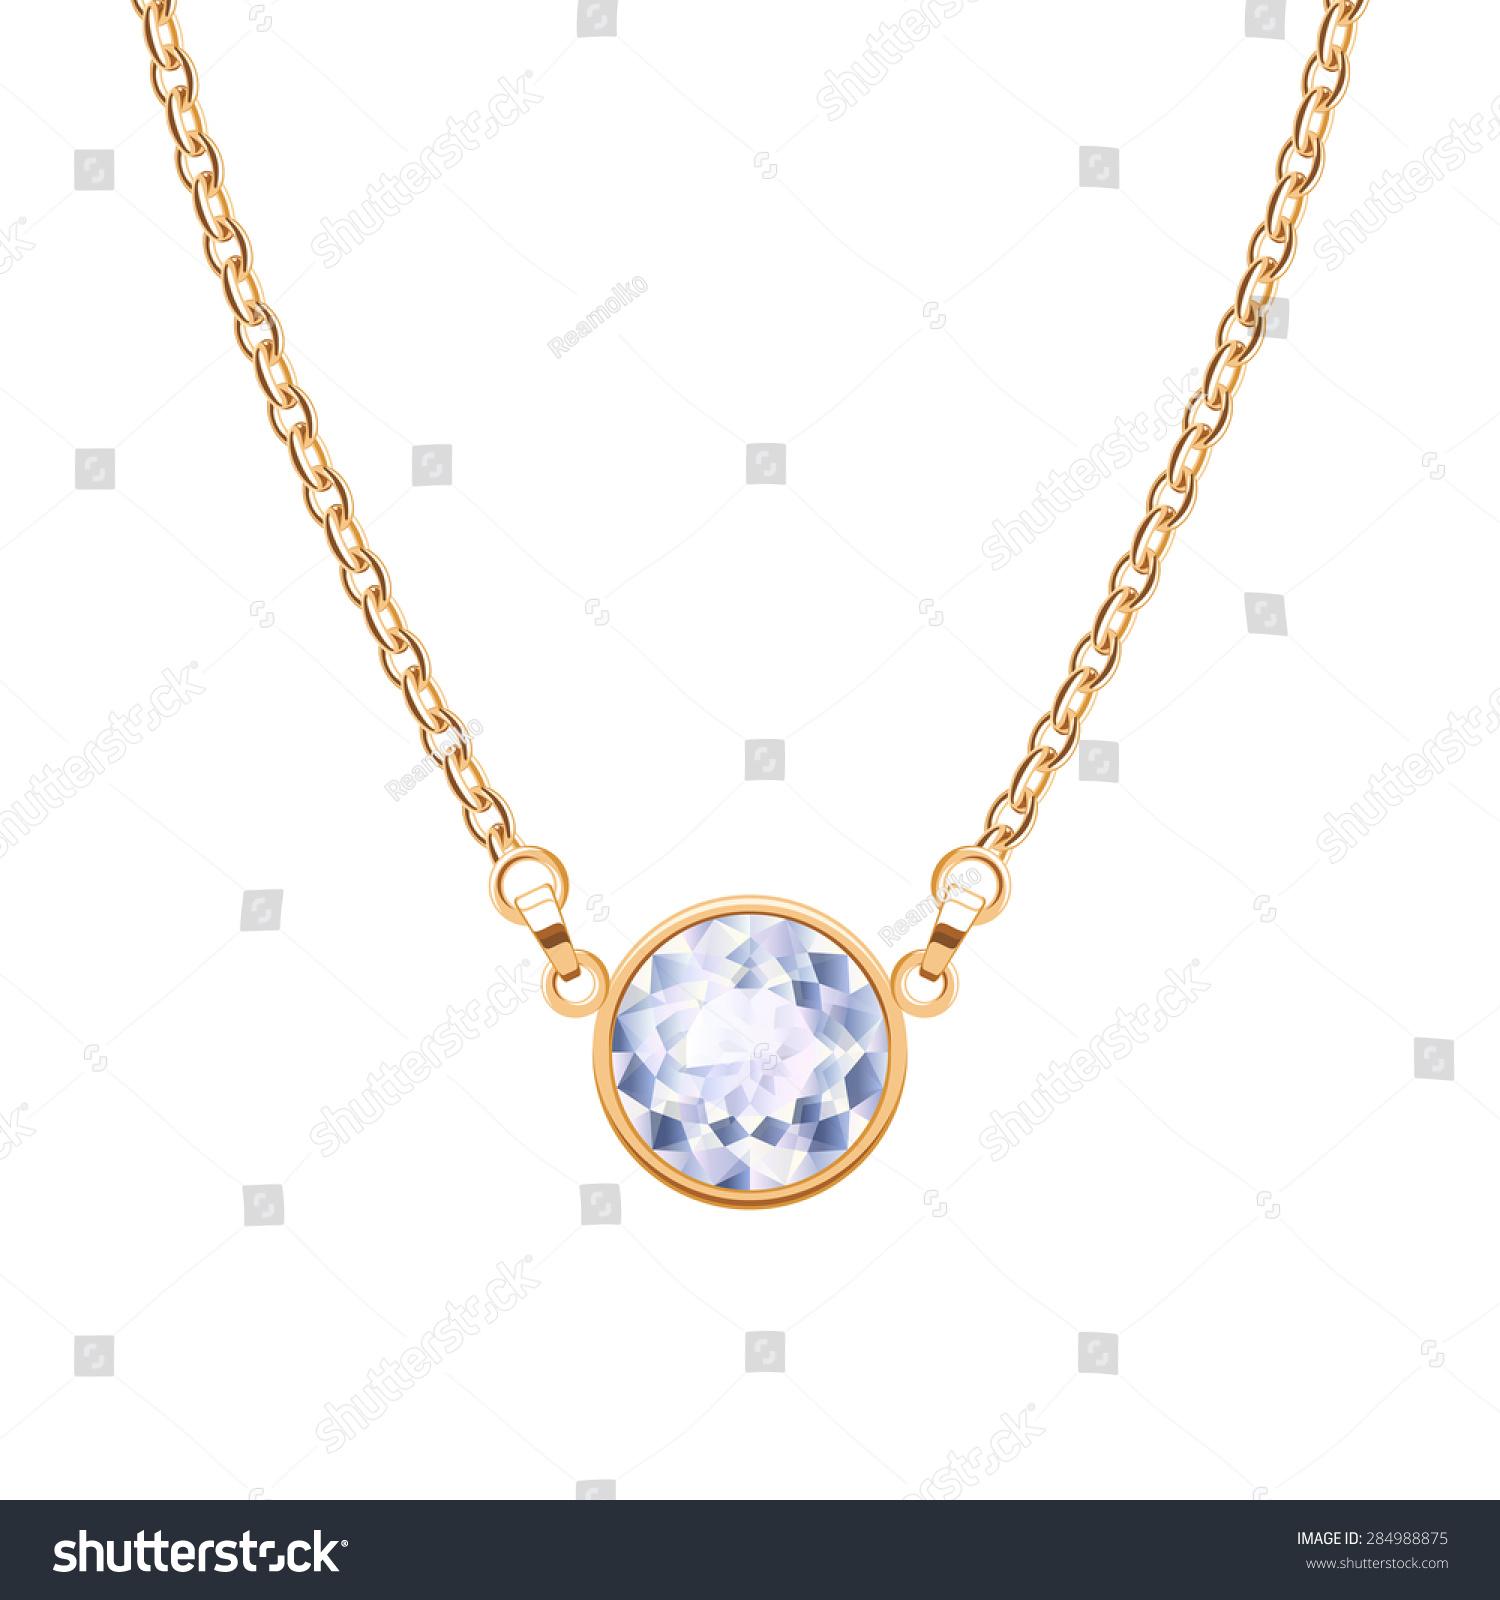 Golden chain necklace round diamond pendant vectores en stock golden chain necklace round diamond pendant vectores en stock 284988875 shutterstock aloadofball Choice Image